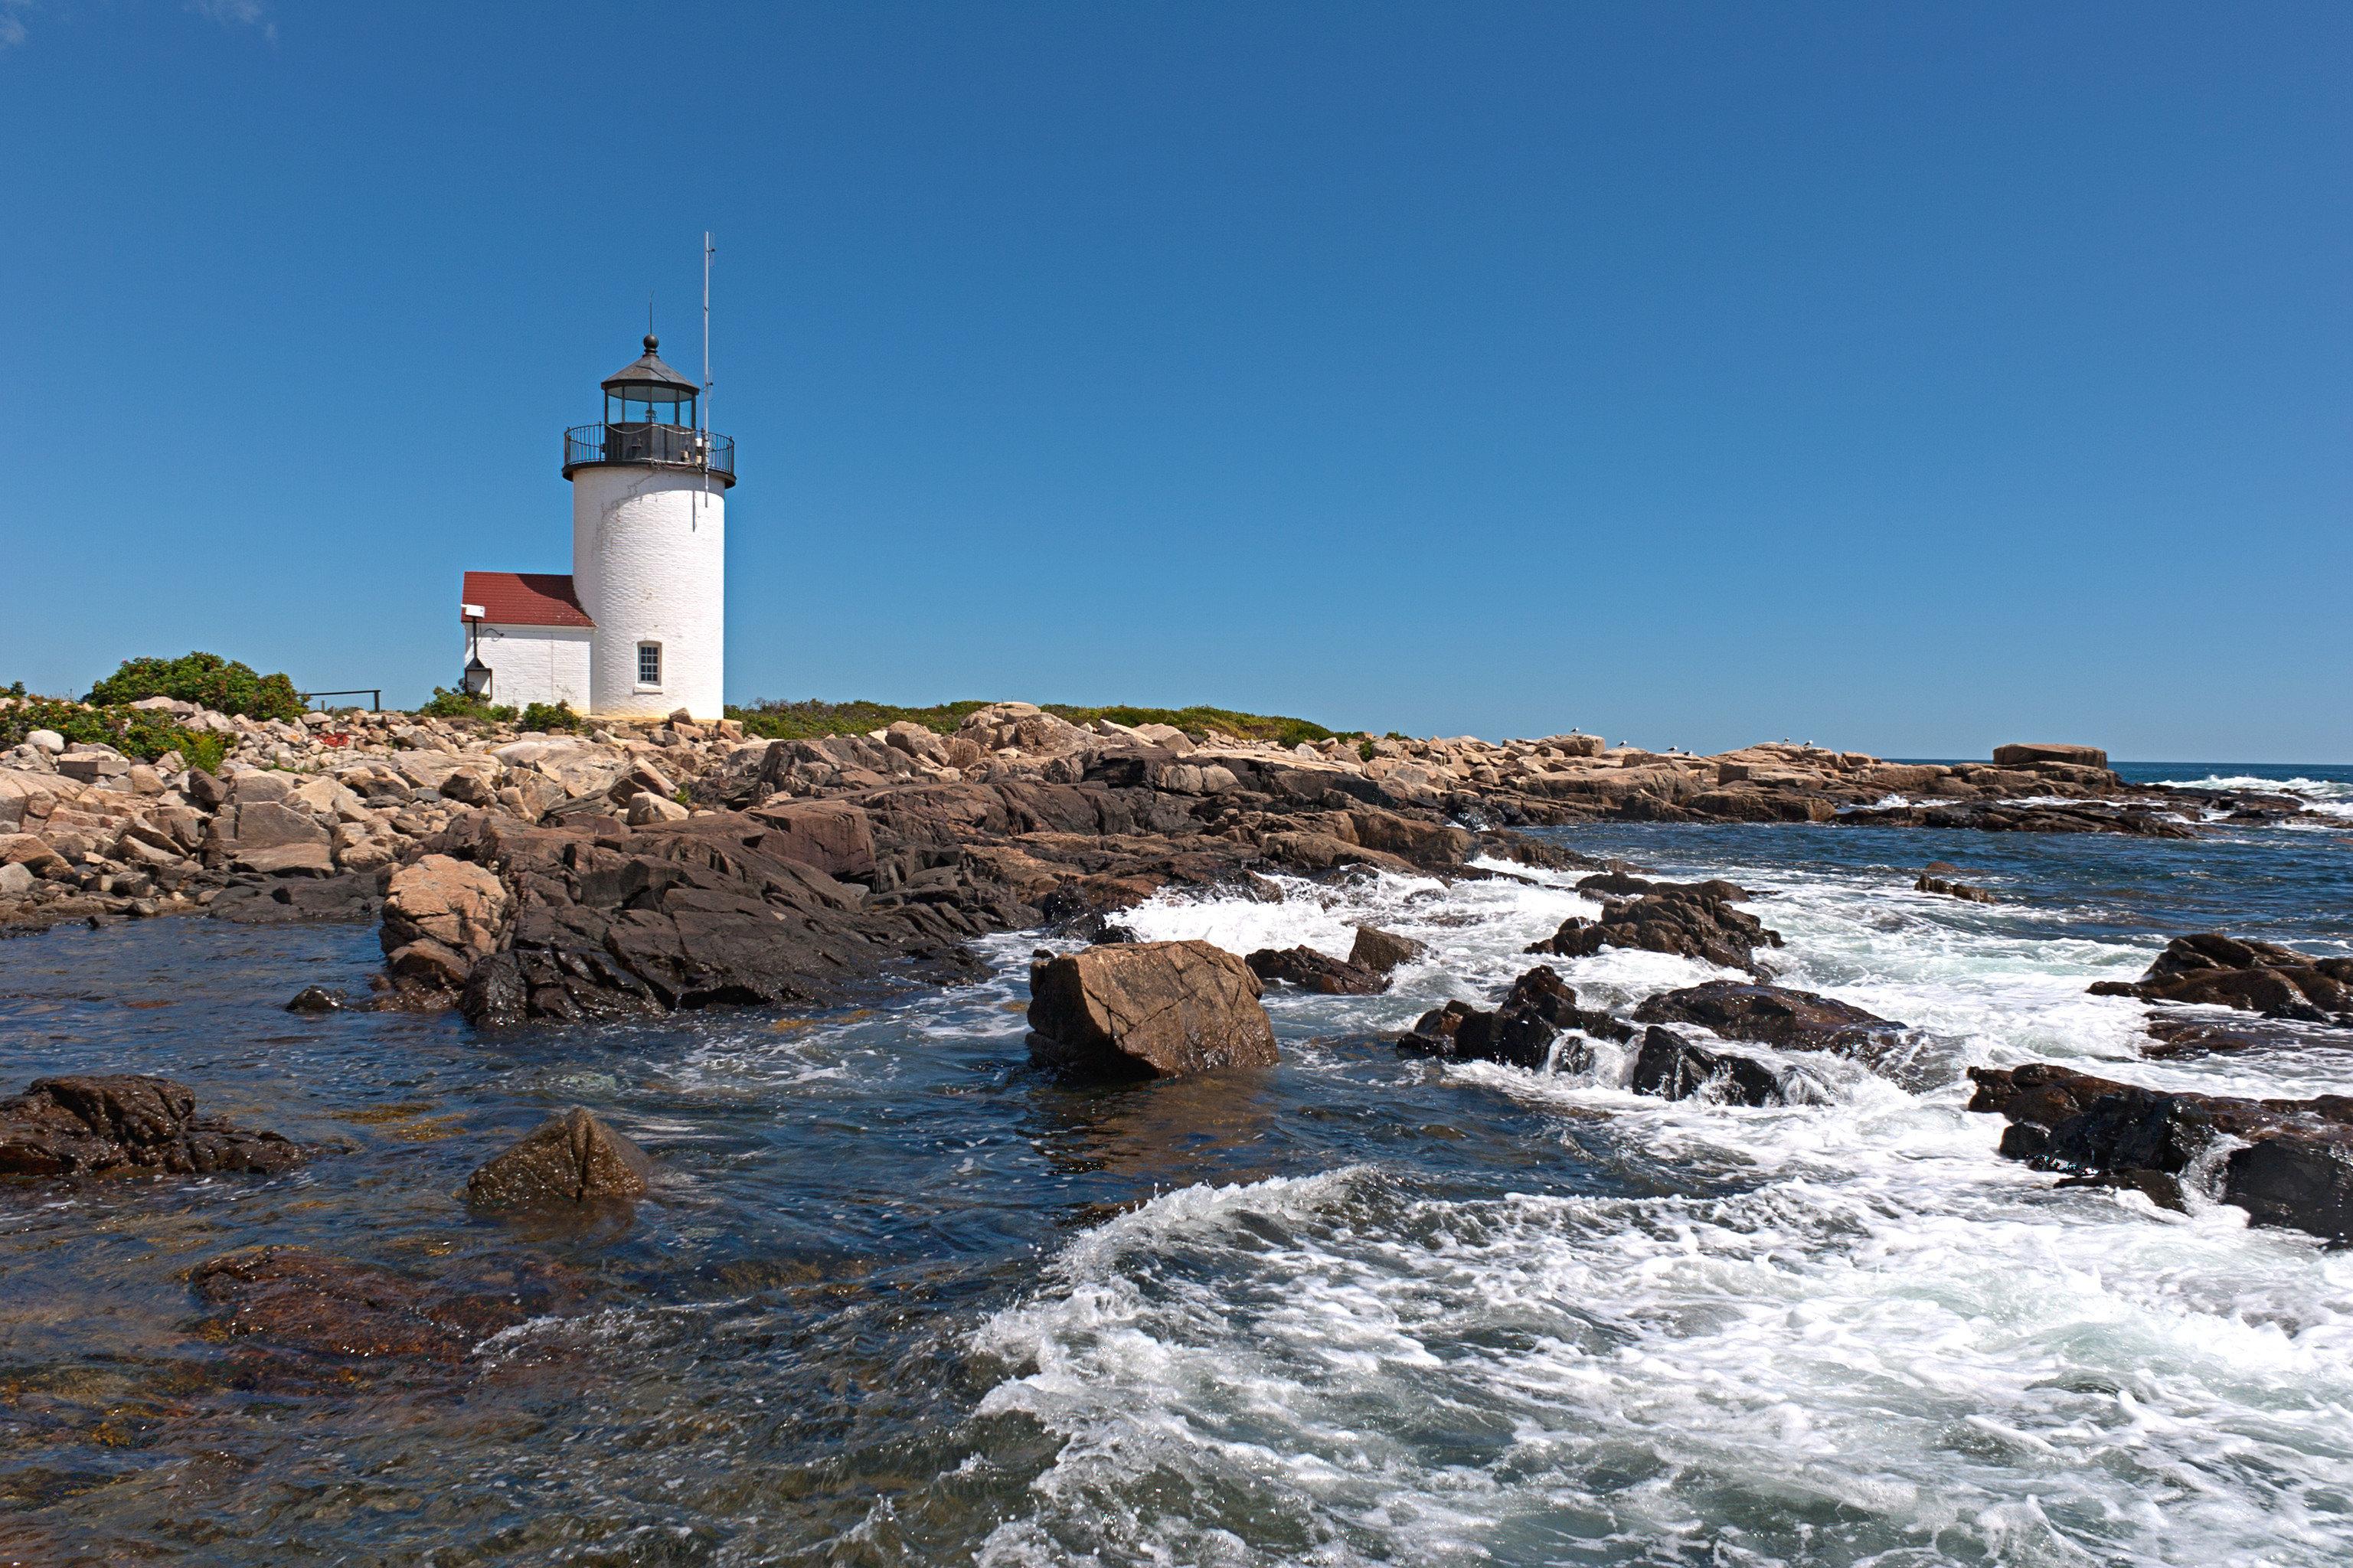 B&B Historic Waterfront sky water lighthouse tower Coast Sea shore Ocean rock wave wind wave Beach cove cape cliff terrain